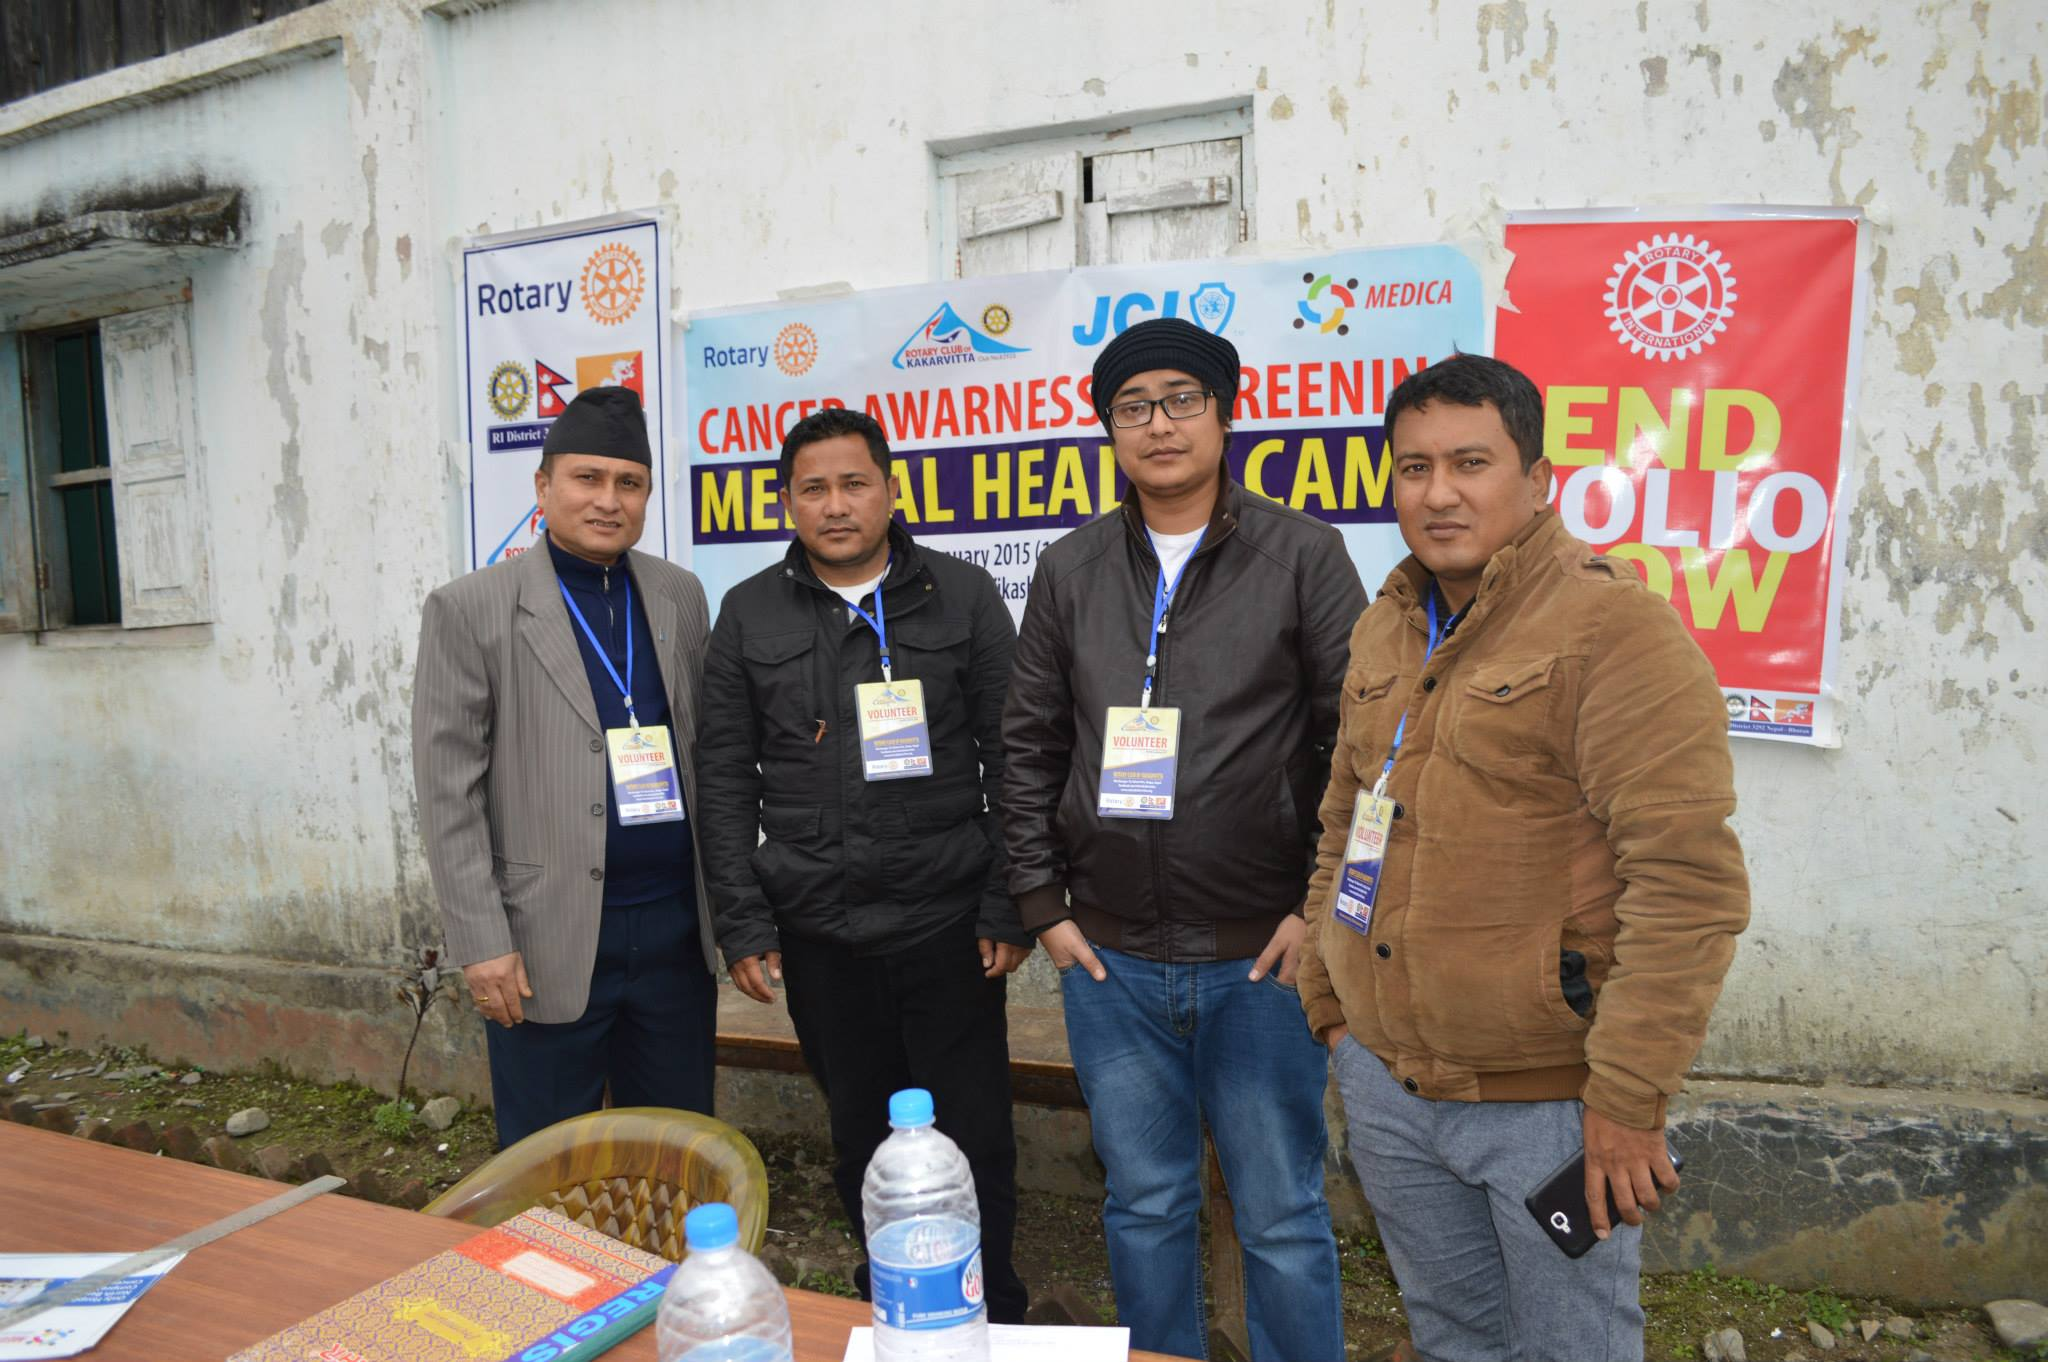 Cancer Awareness Screening Medical Health Camp 7